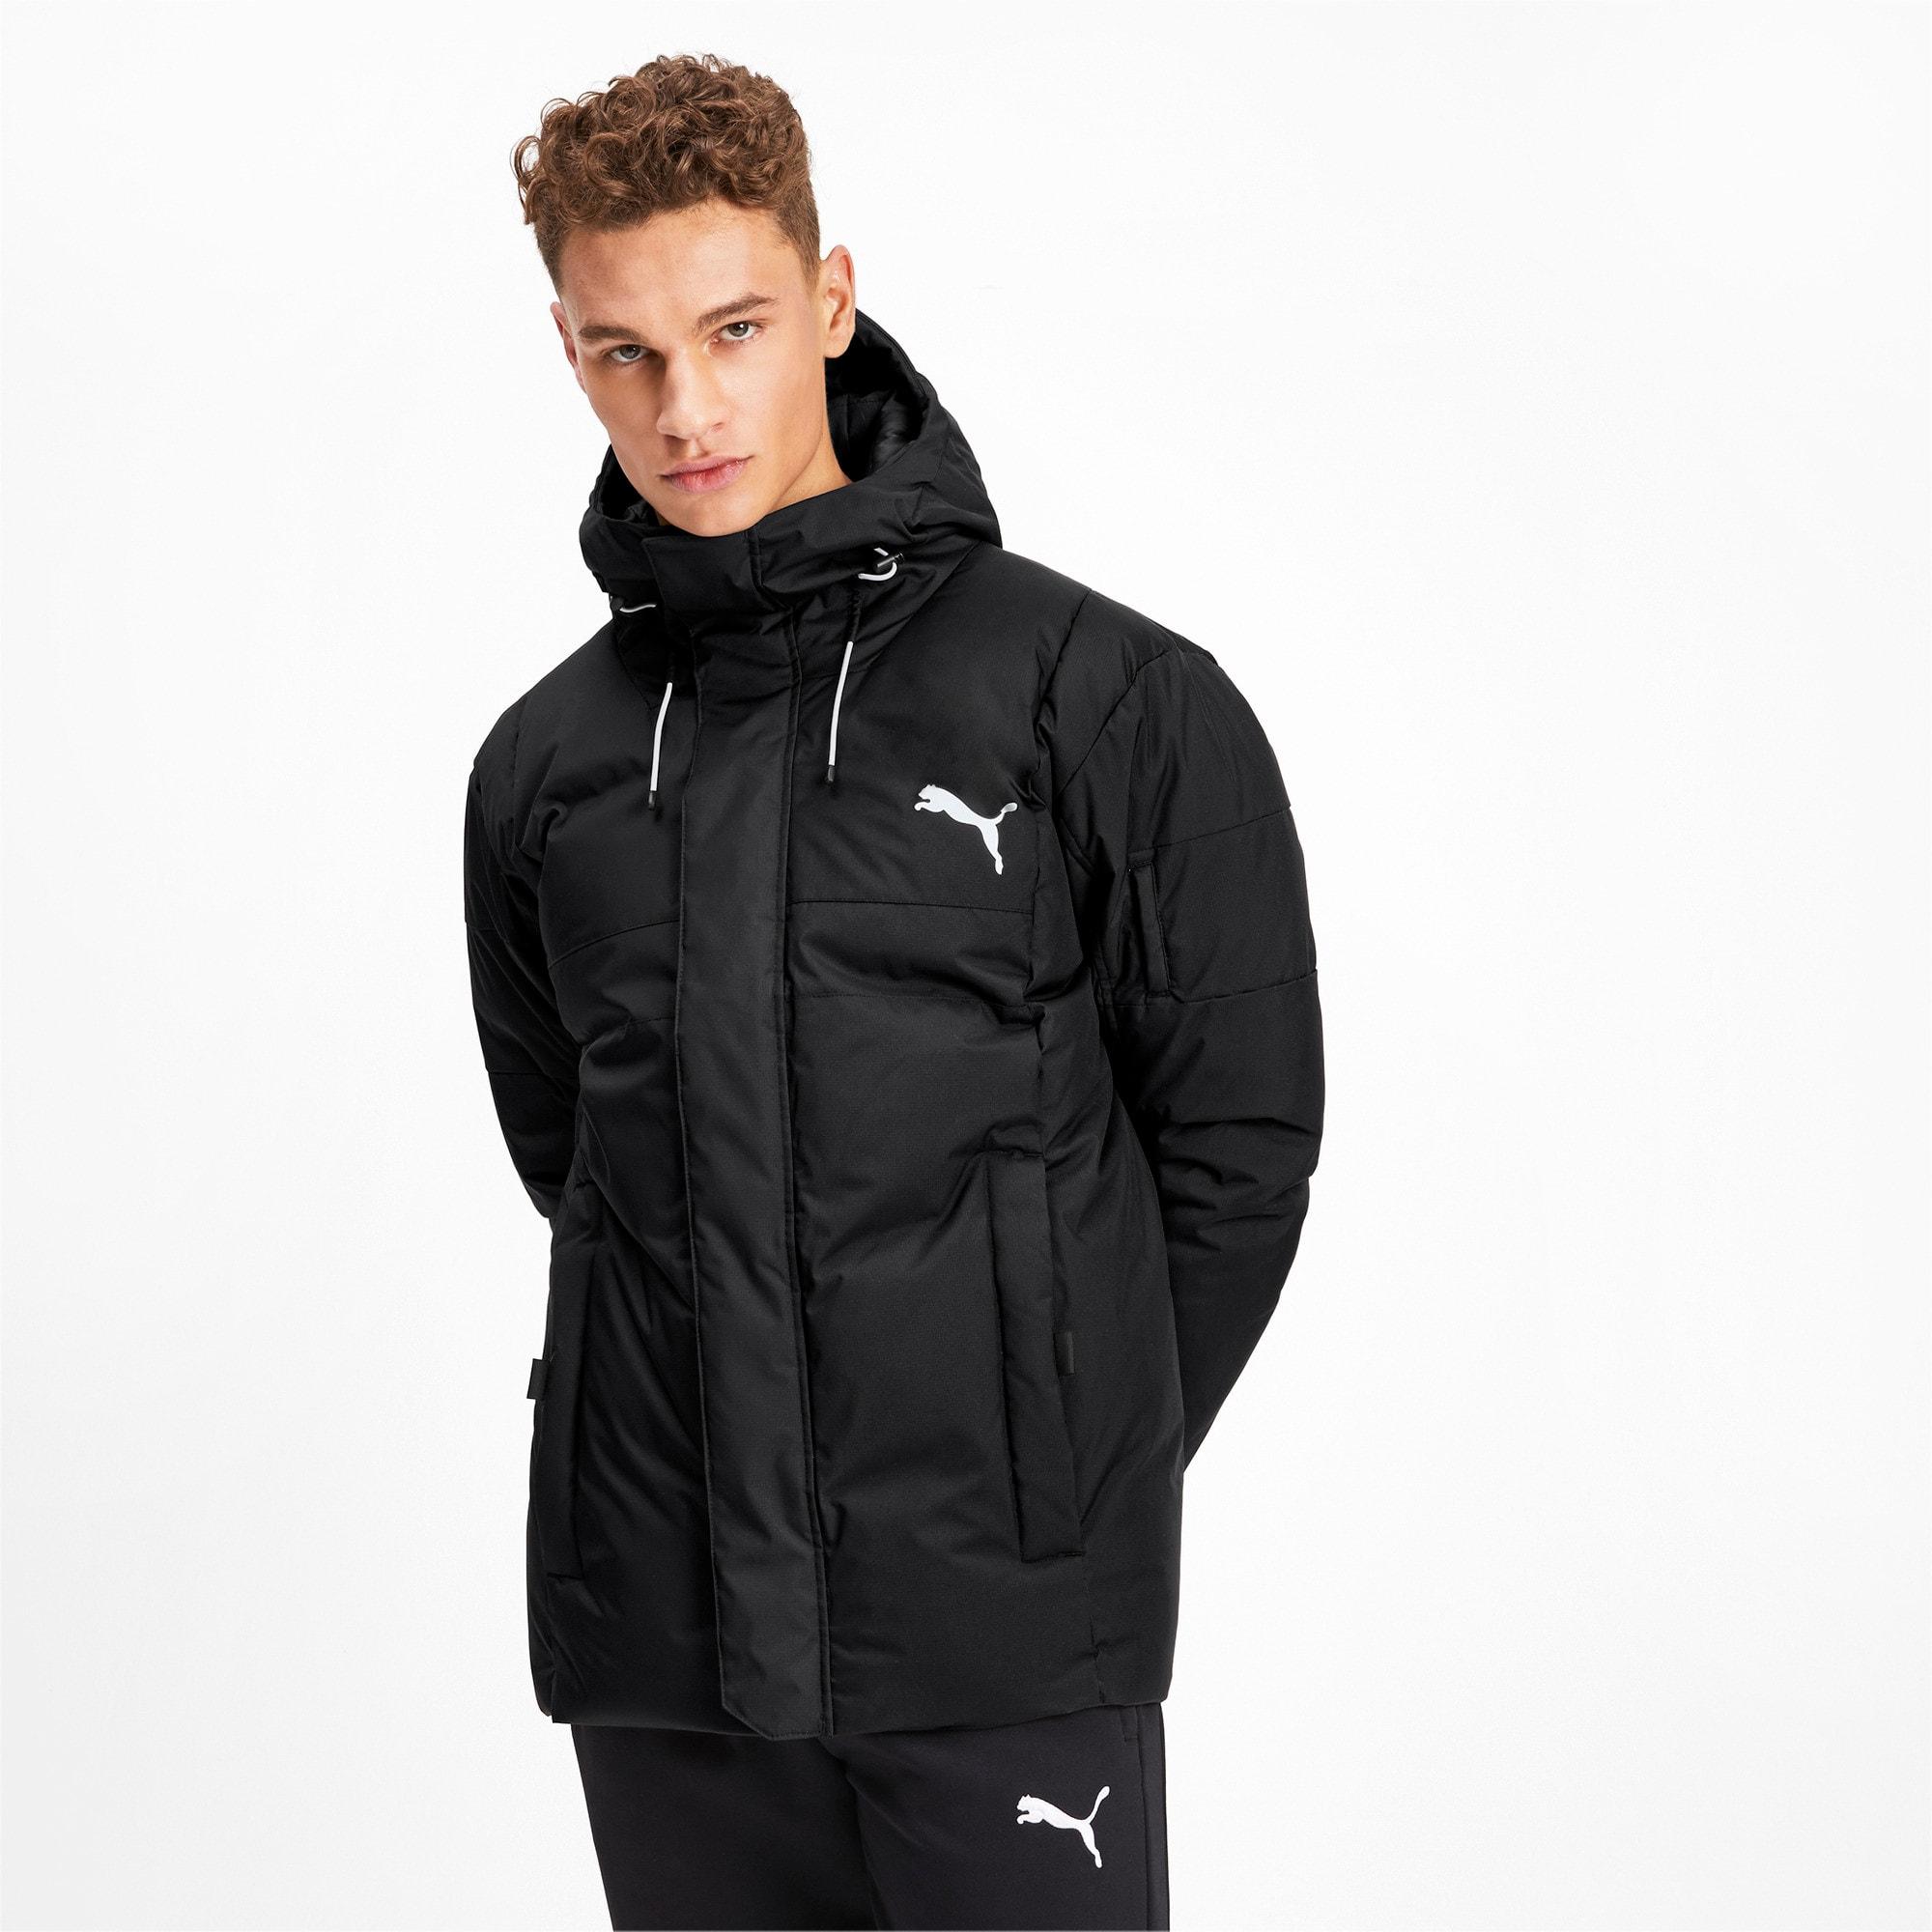 Thumbnail 1 of 650 Protective Down Men's Jacket, Puma Black, medium